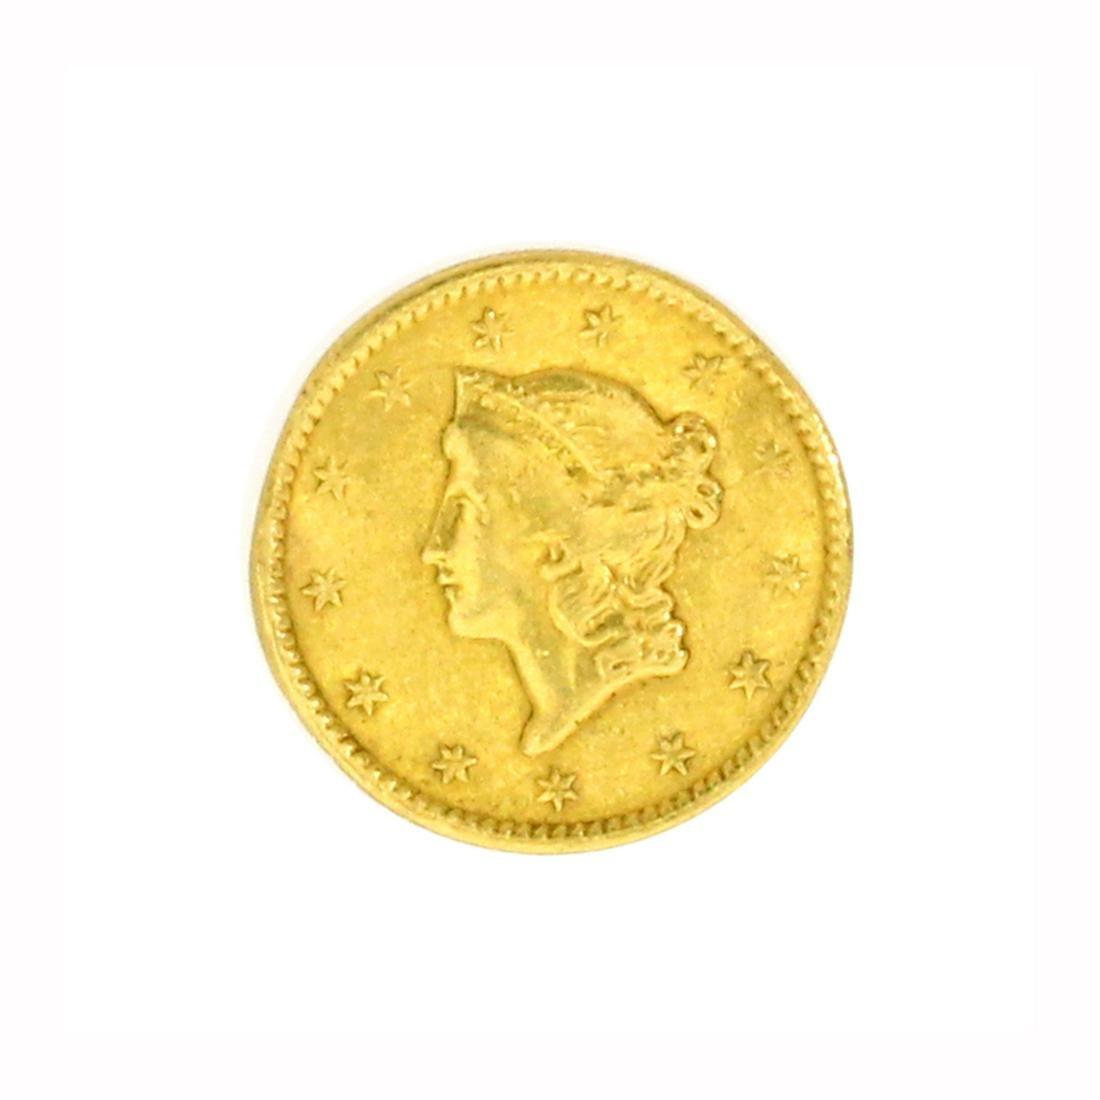 Rare 1849 $1 U.S. Liberty Head Gold Coin